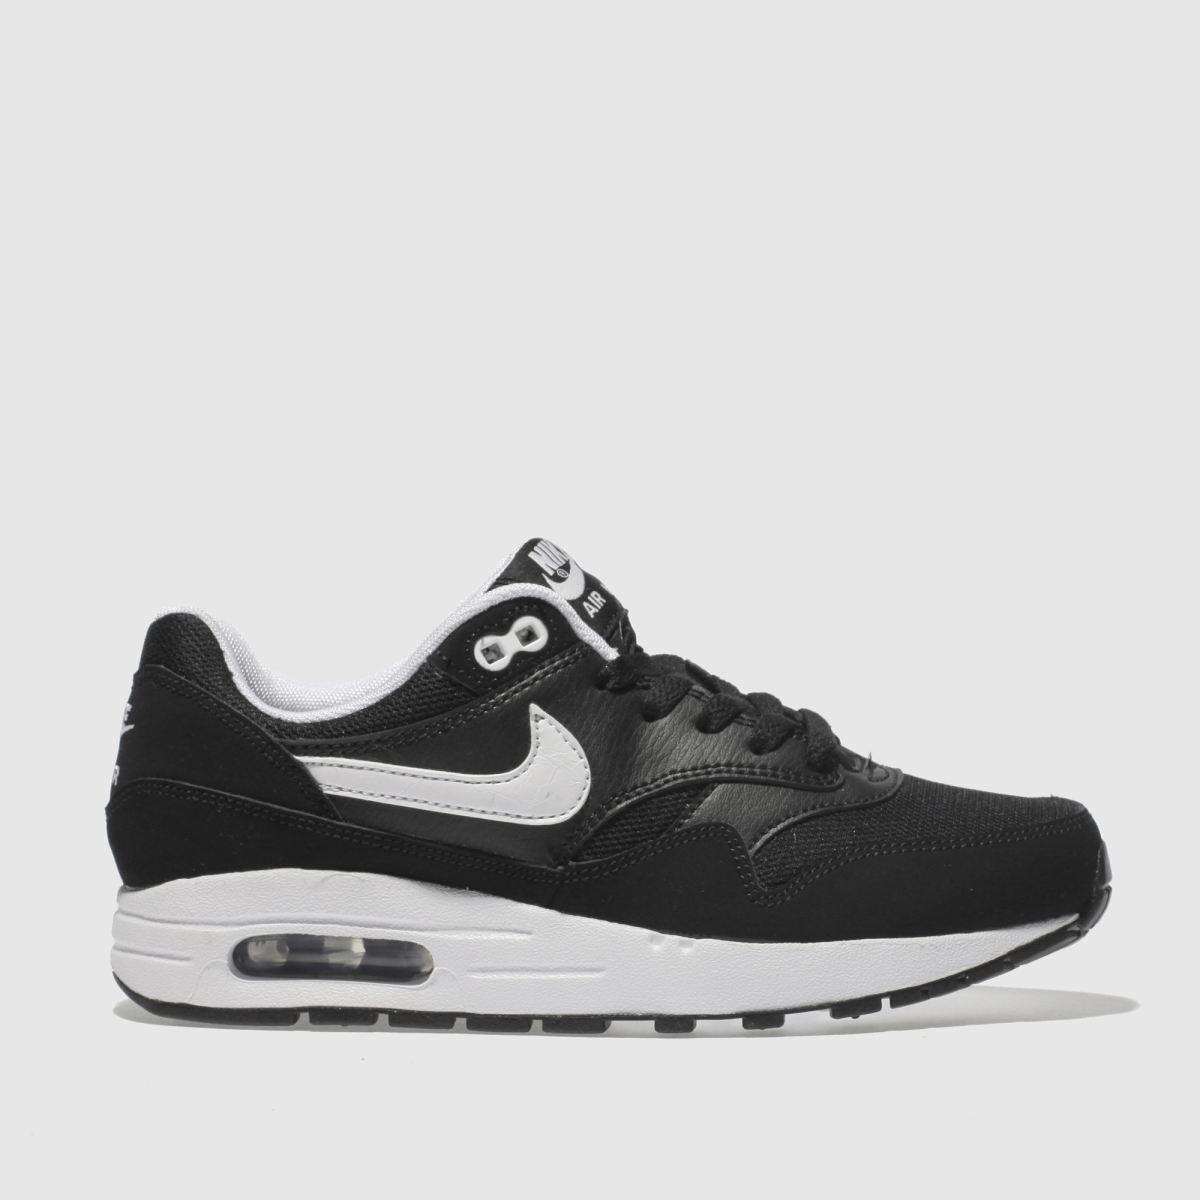 Nike Black & White Air Max 1 Boys Youth Trainers